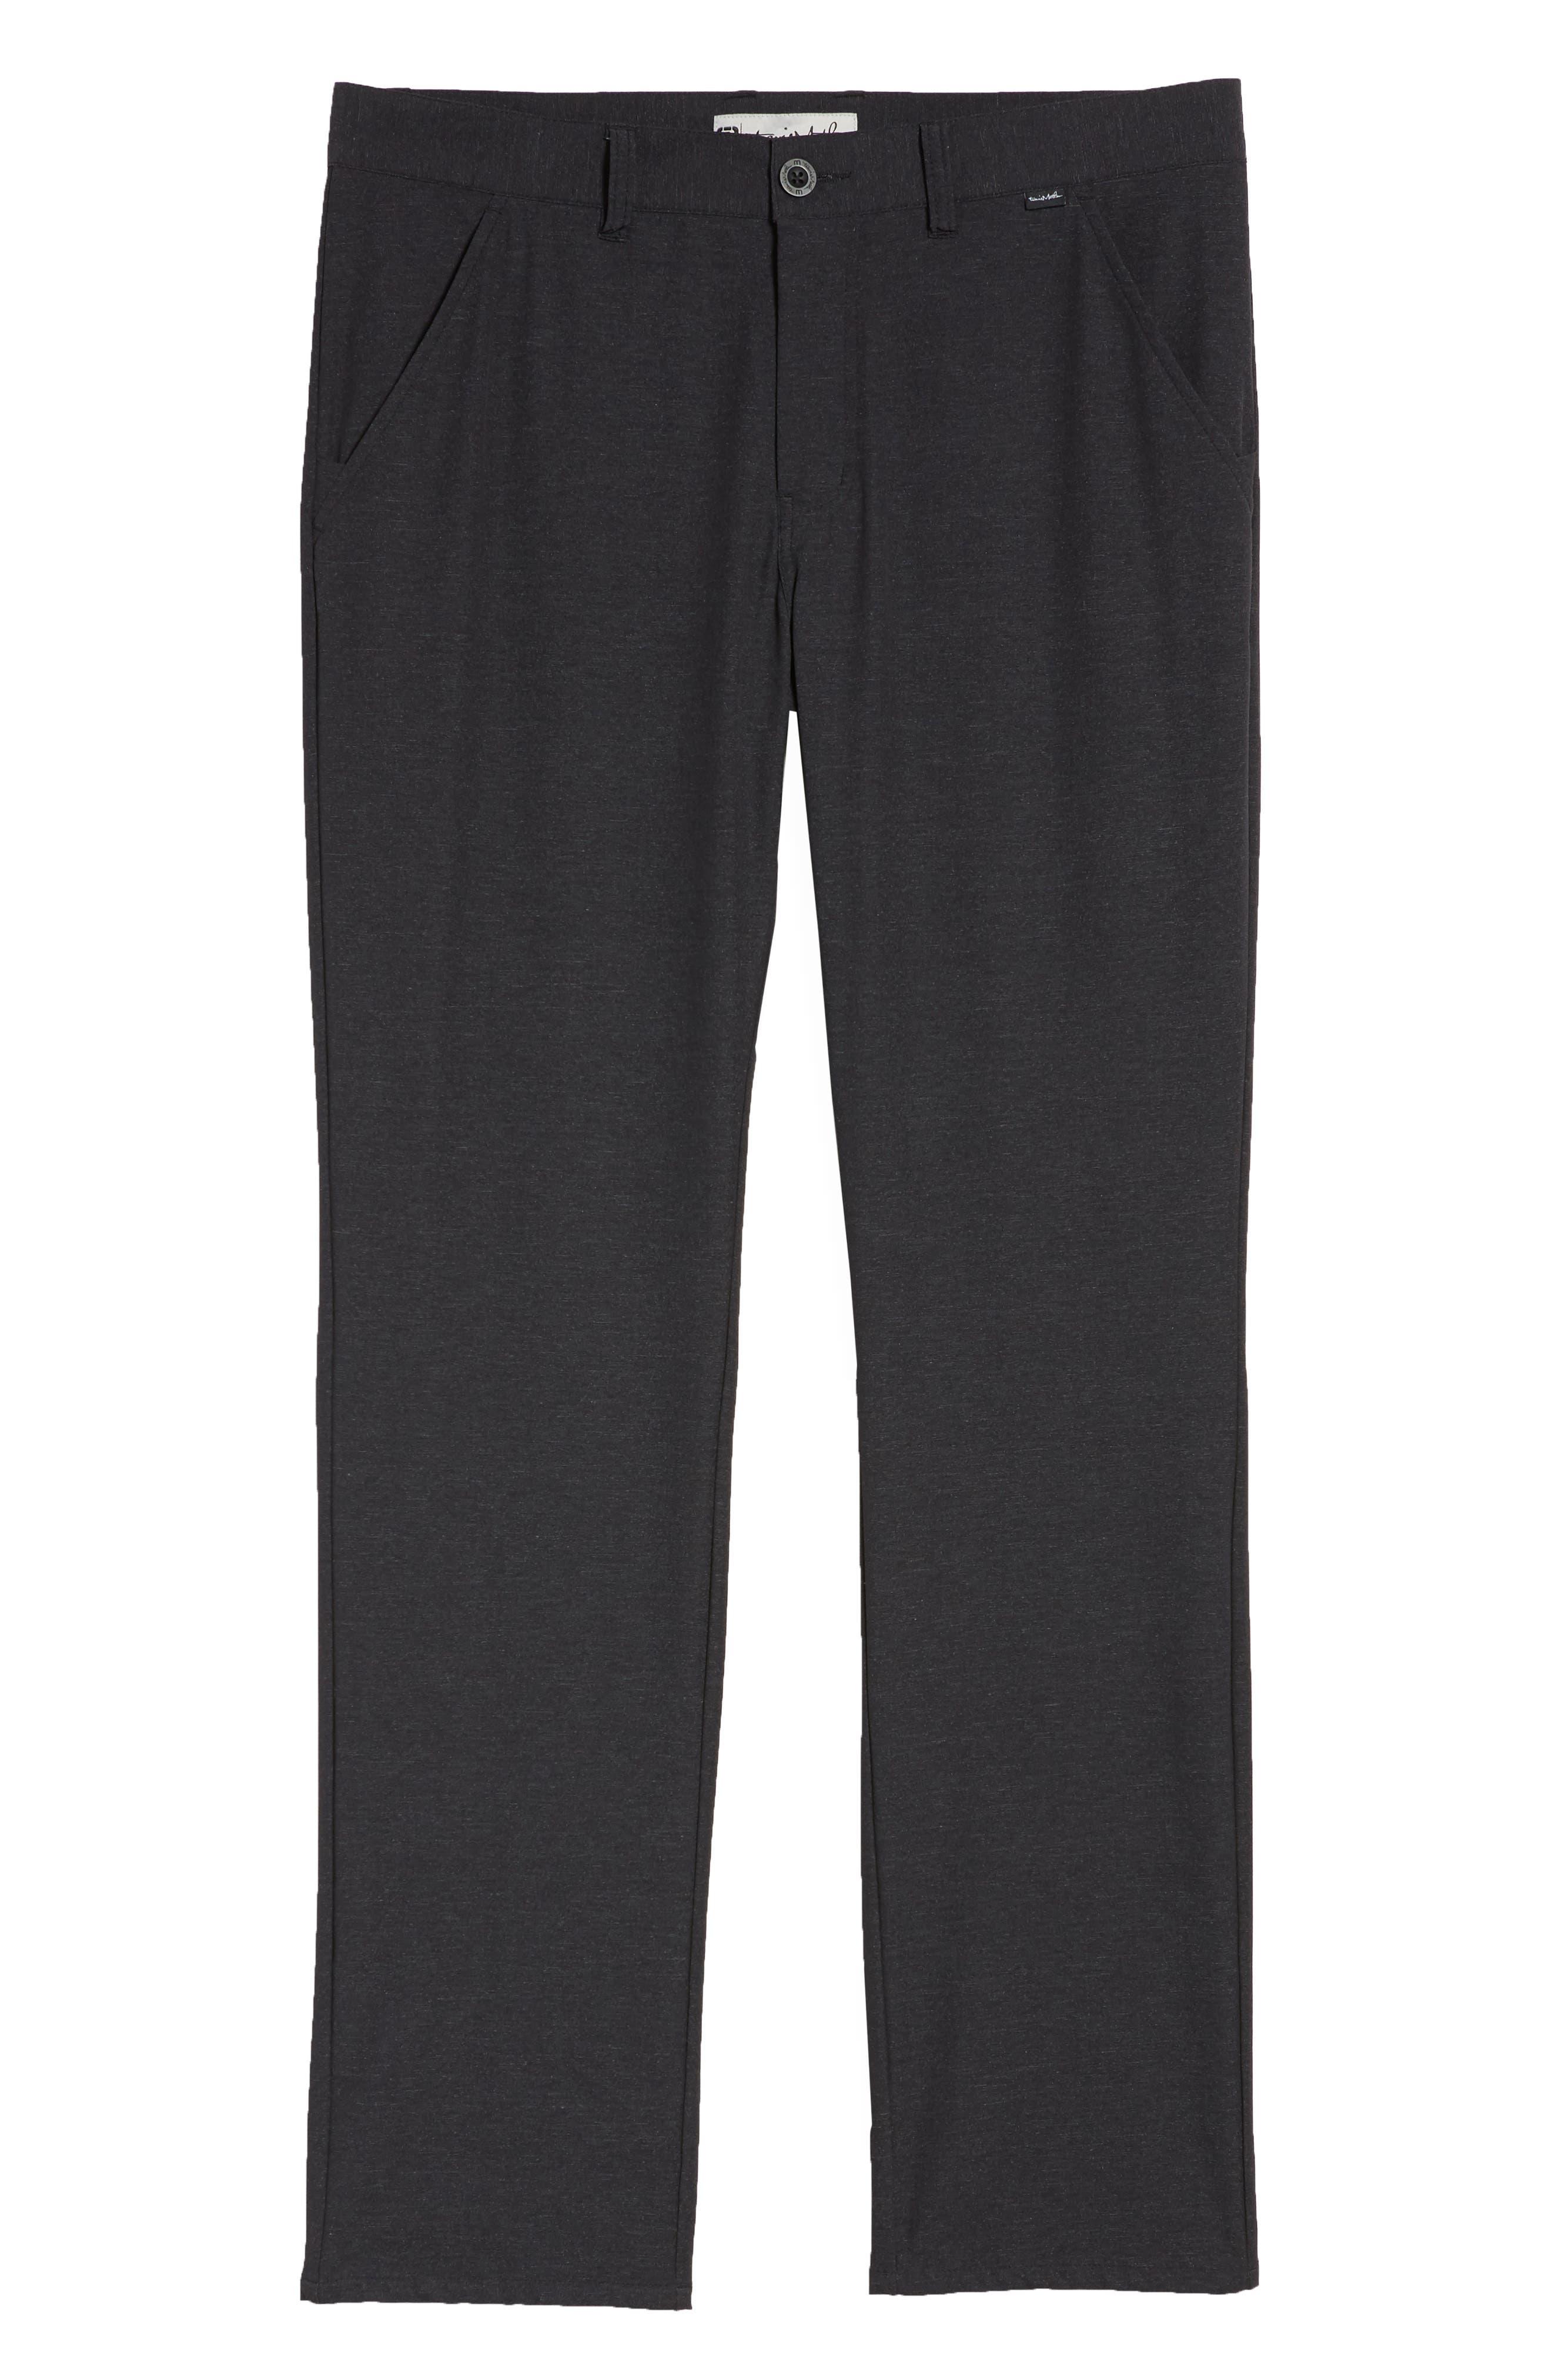 Mercurio Regular Fit Four-Way Stretch Pants,                             Alternate thumbnail 6, color,                             HEATHER BLACK